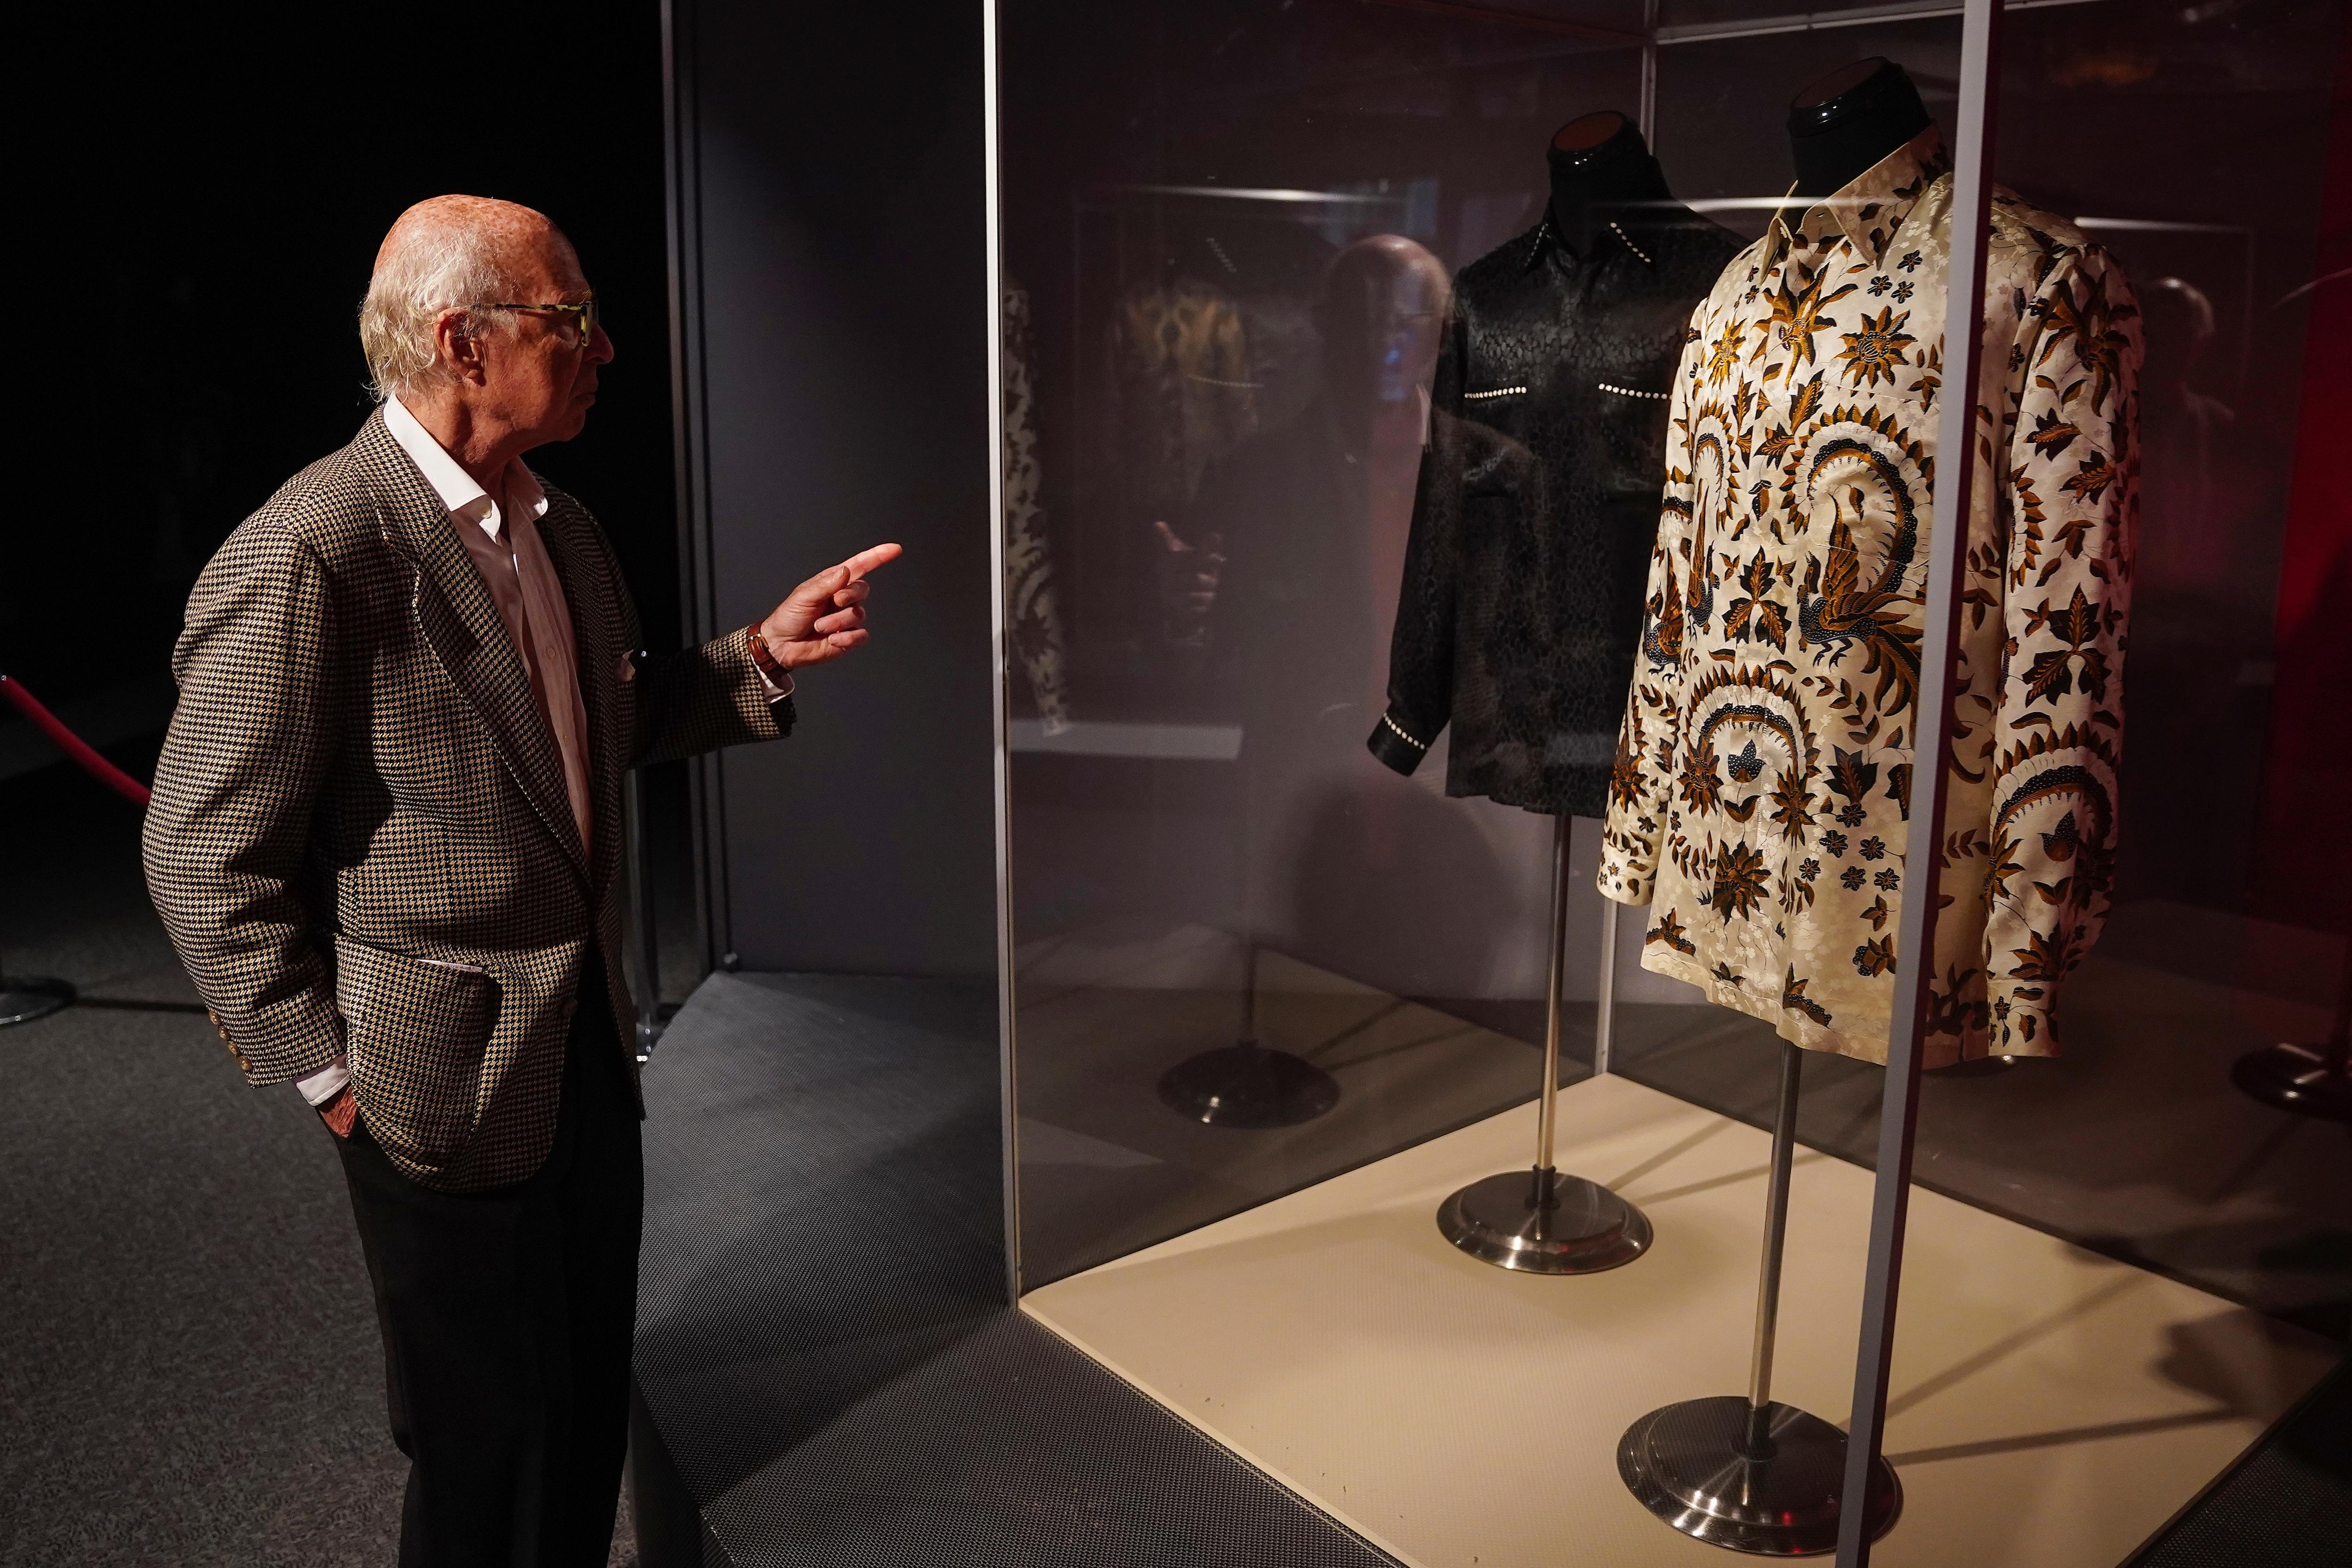 Nelson Mandela's Famous 'Fashion Statement' Shirts, Belongings Up For Auction